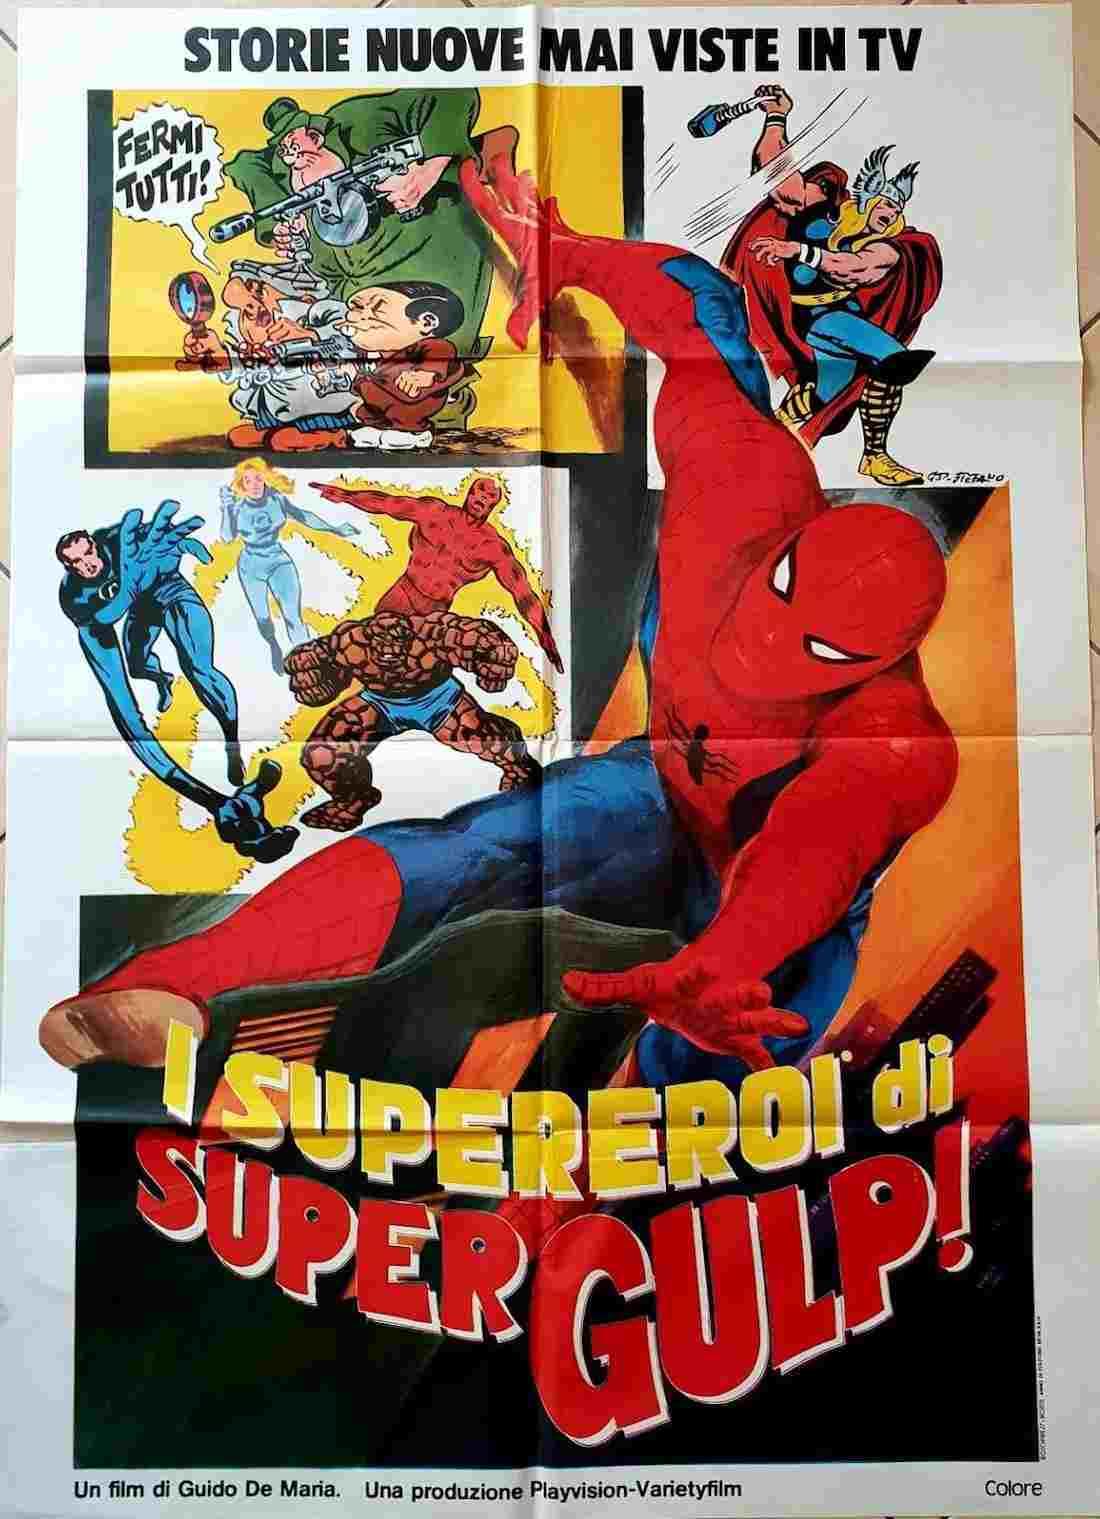 manifesto i supereroi di Supergulp